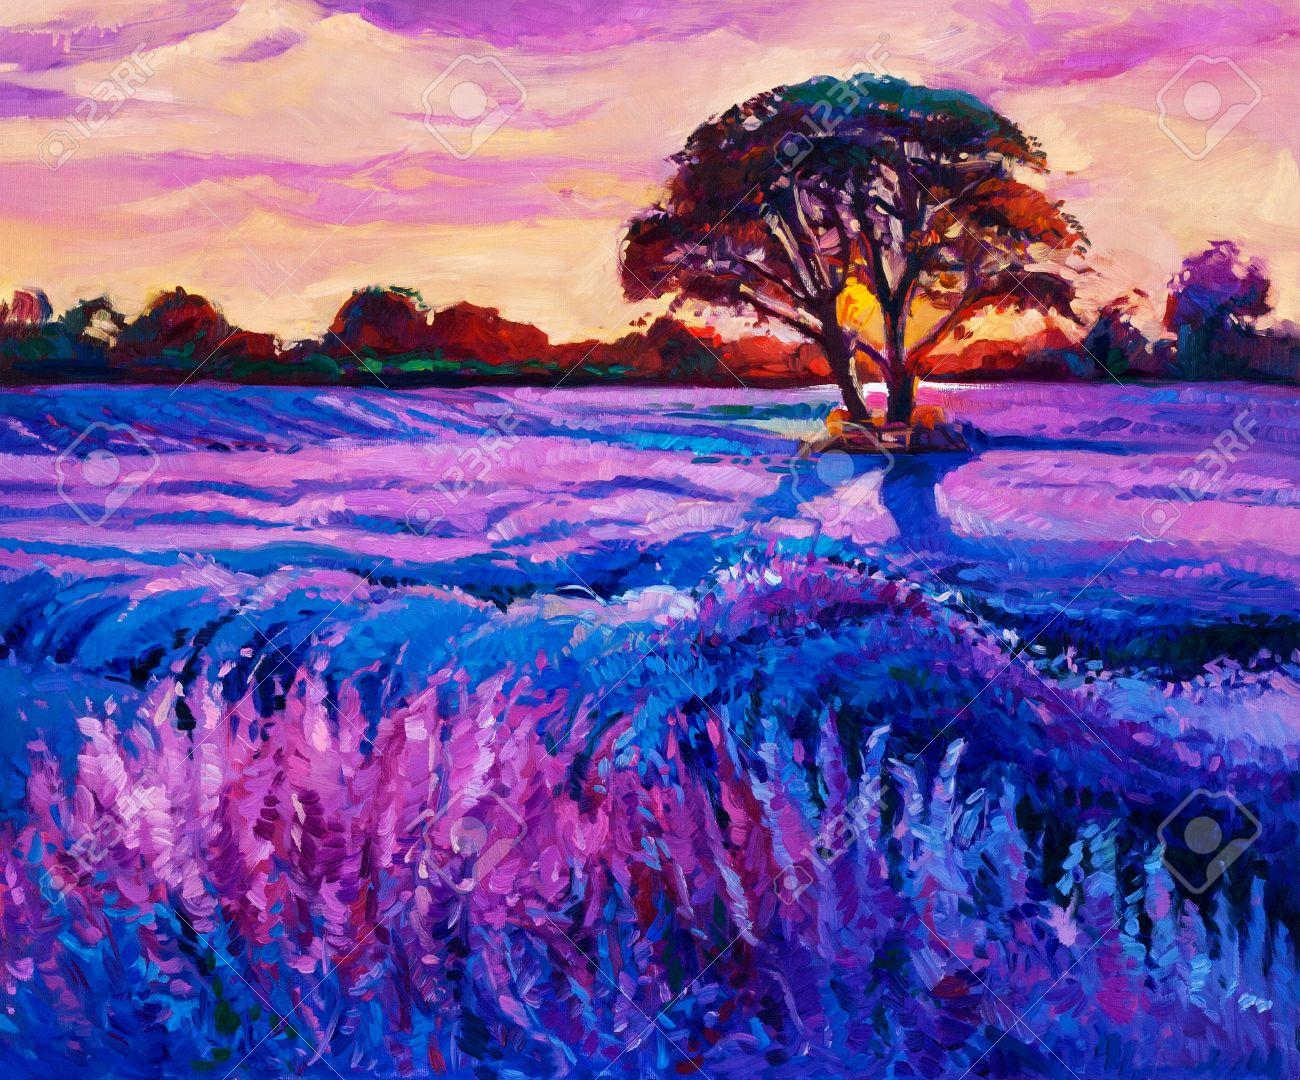 Original Oil Painting Of Lavender Fields On Canvas Rich Purple Sunset Landscape Modern Impressionism Banco De Imagens Royalty Free Ilustracoes Imagens E Banco De Imagens Image 37791118